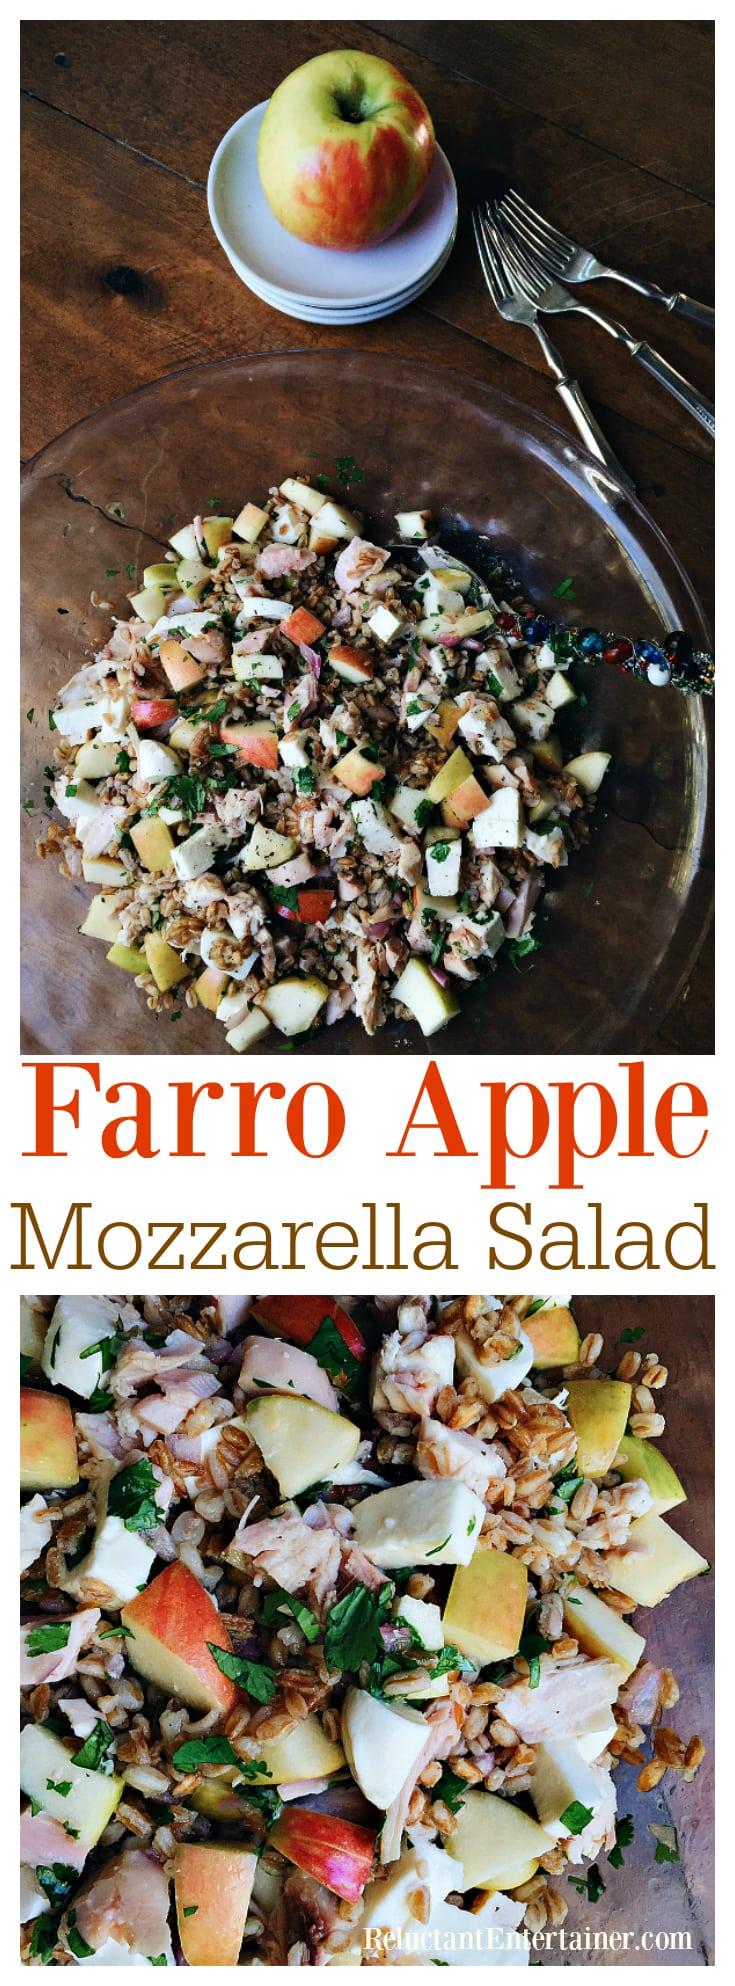 Farro Apple Mozzarella Salad - Reluctant Entertainer